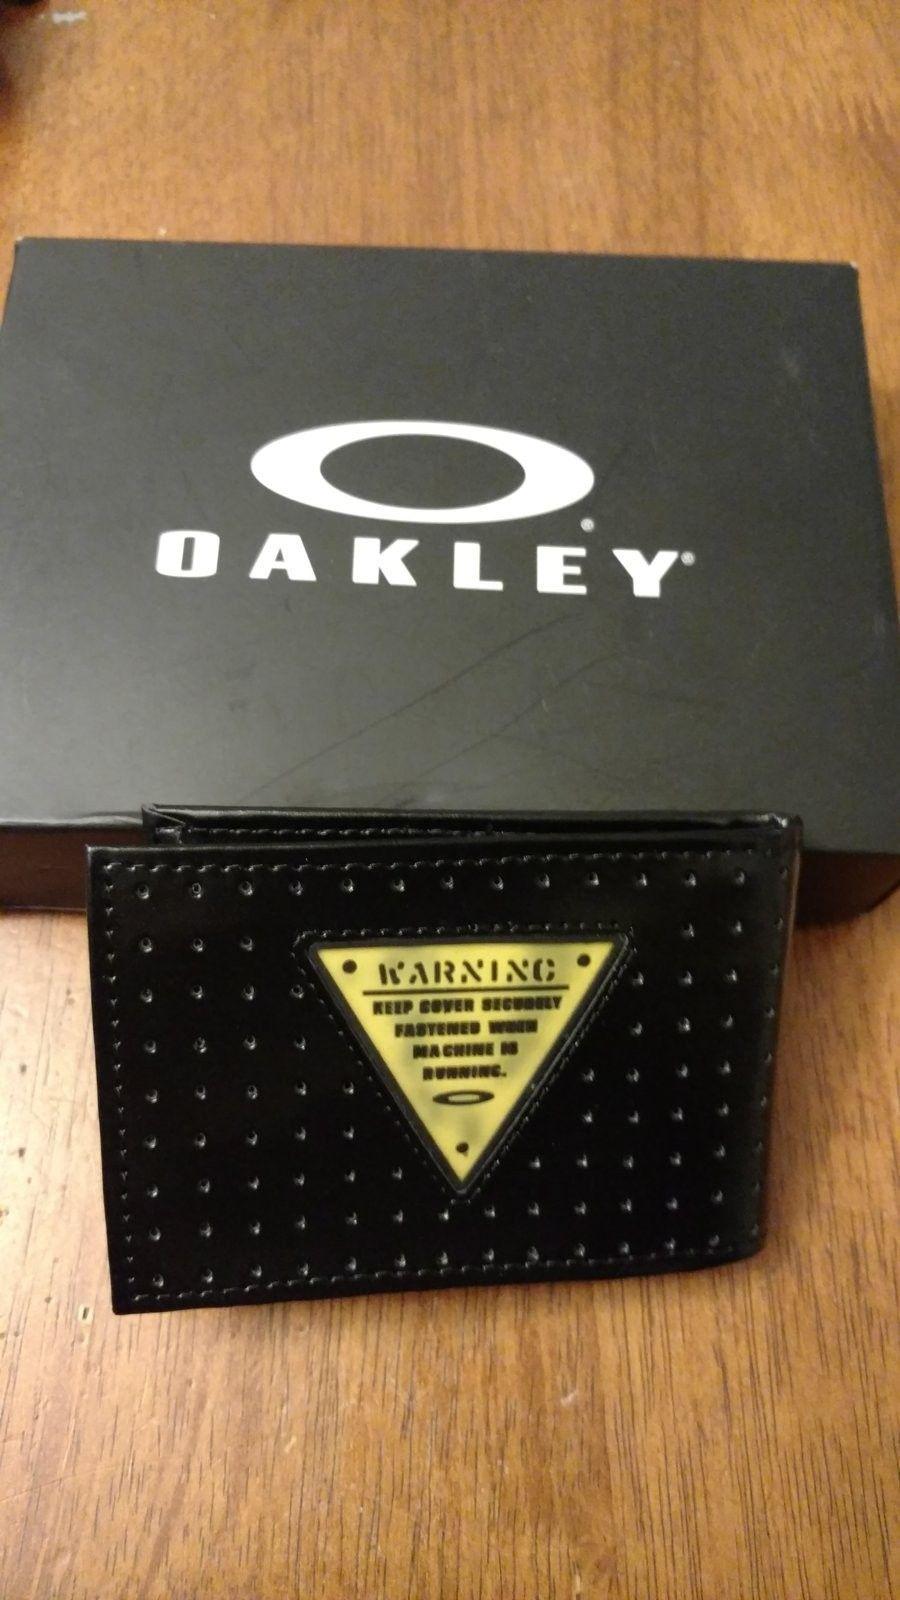 Oakley Wallet Credit Card Holder - IMG_20160628_184355723.jpg